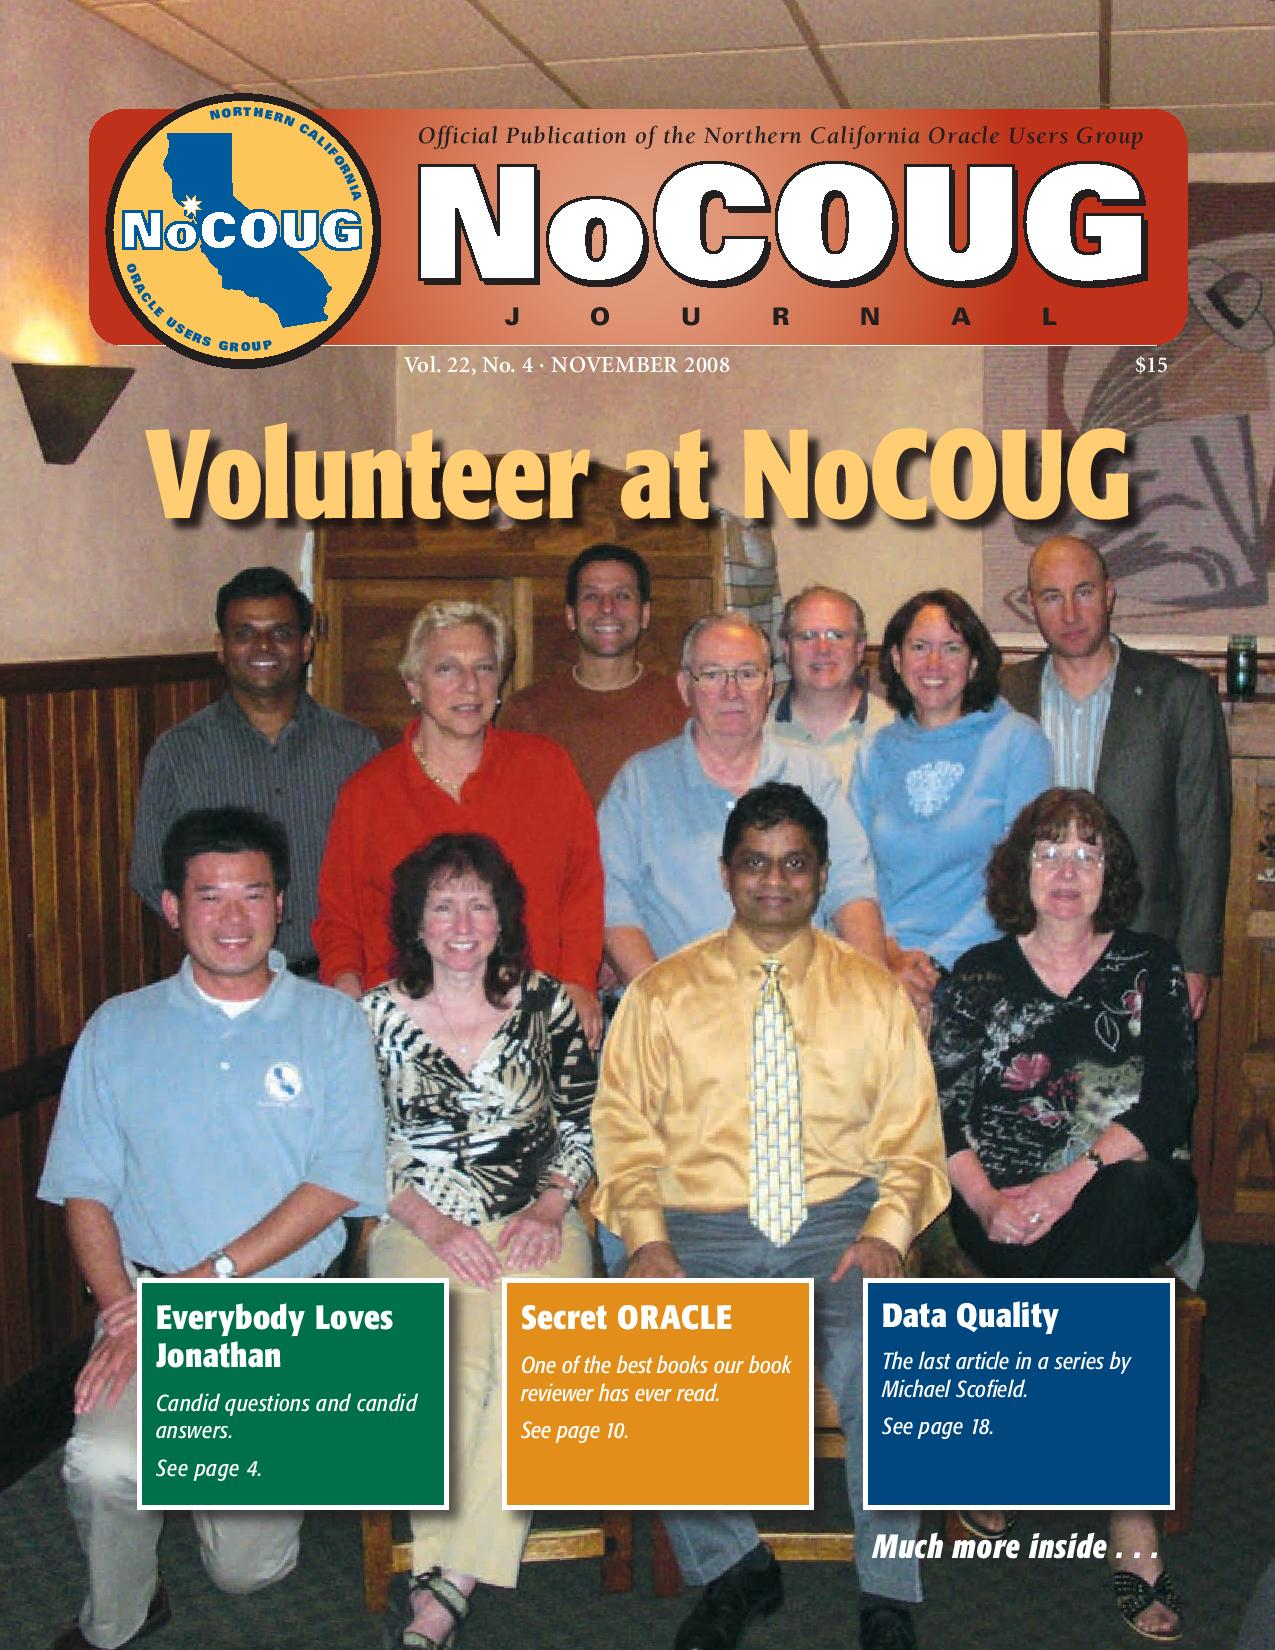 NoCOUG Journal 2008 11